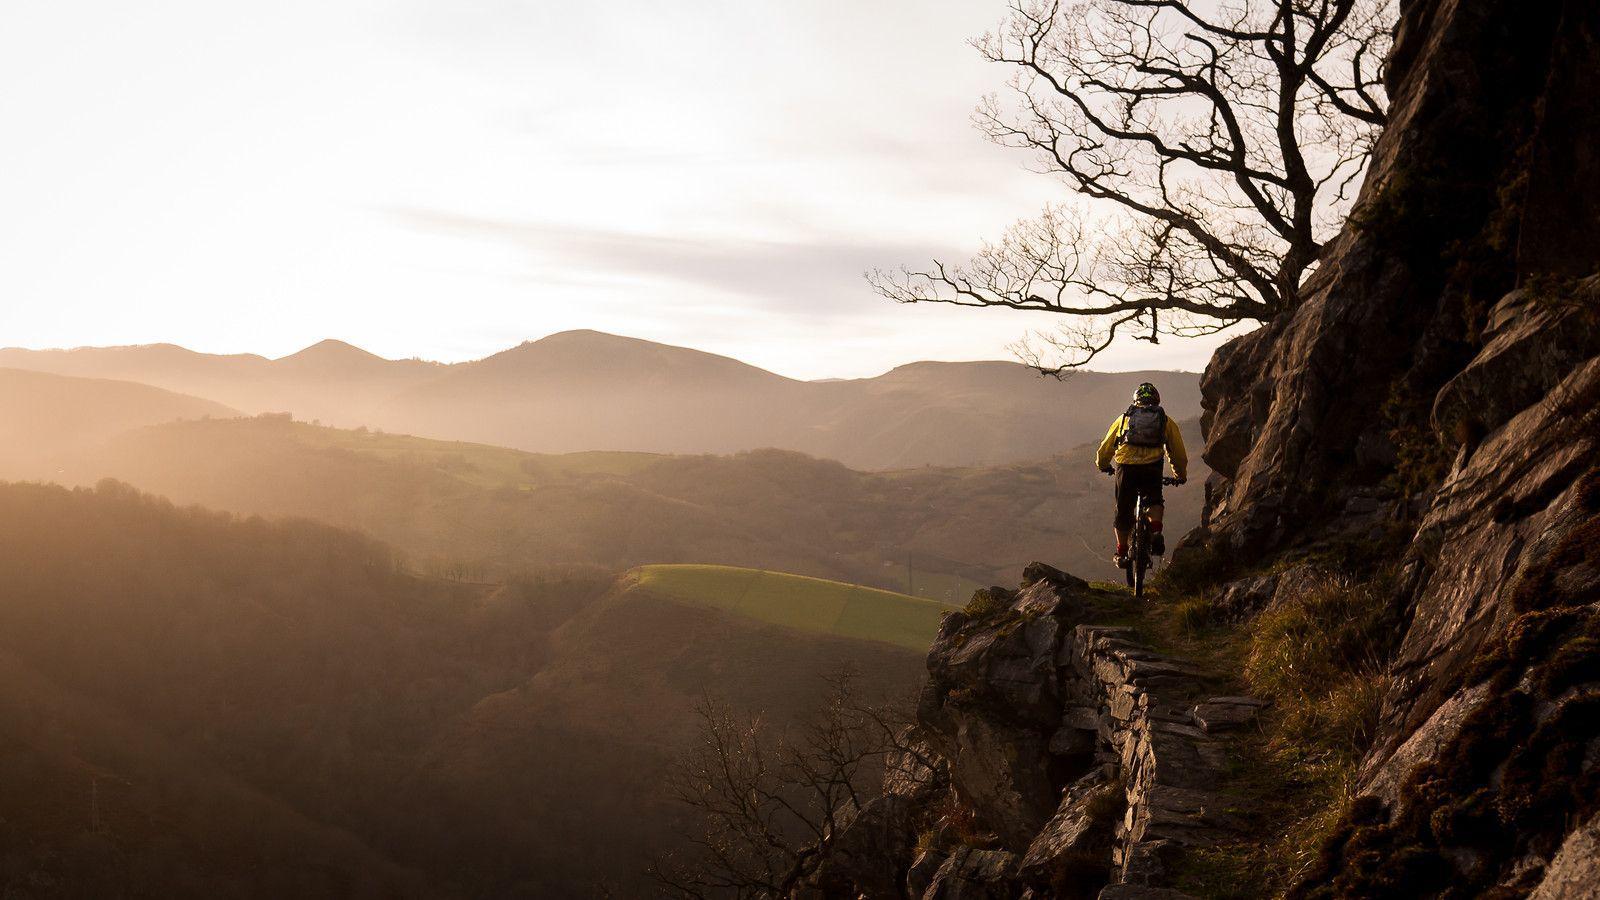 Mountain Bike Trail Wallpapers Top Free Mountain Bike Trail Backgrounds Wallpaperaccess